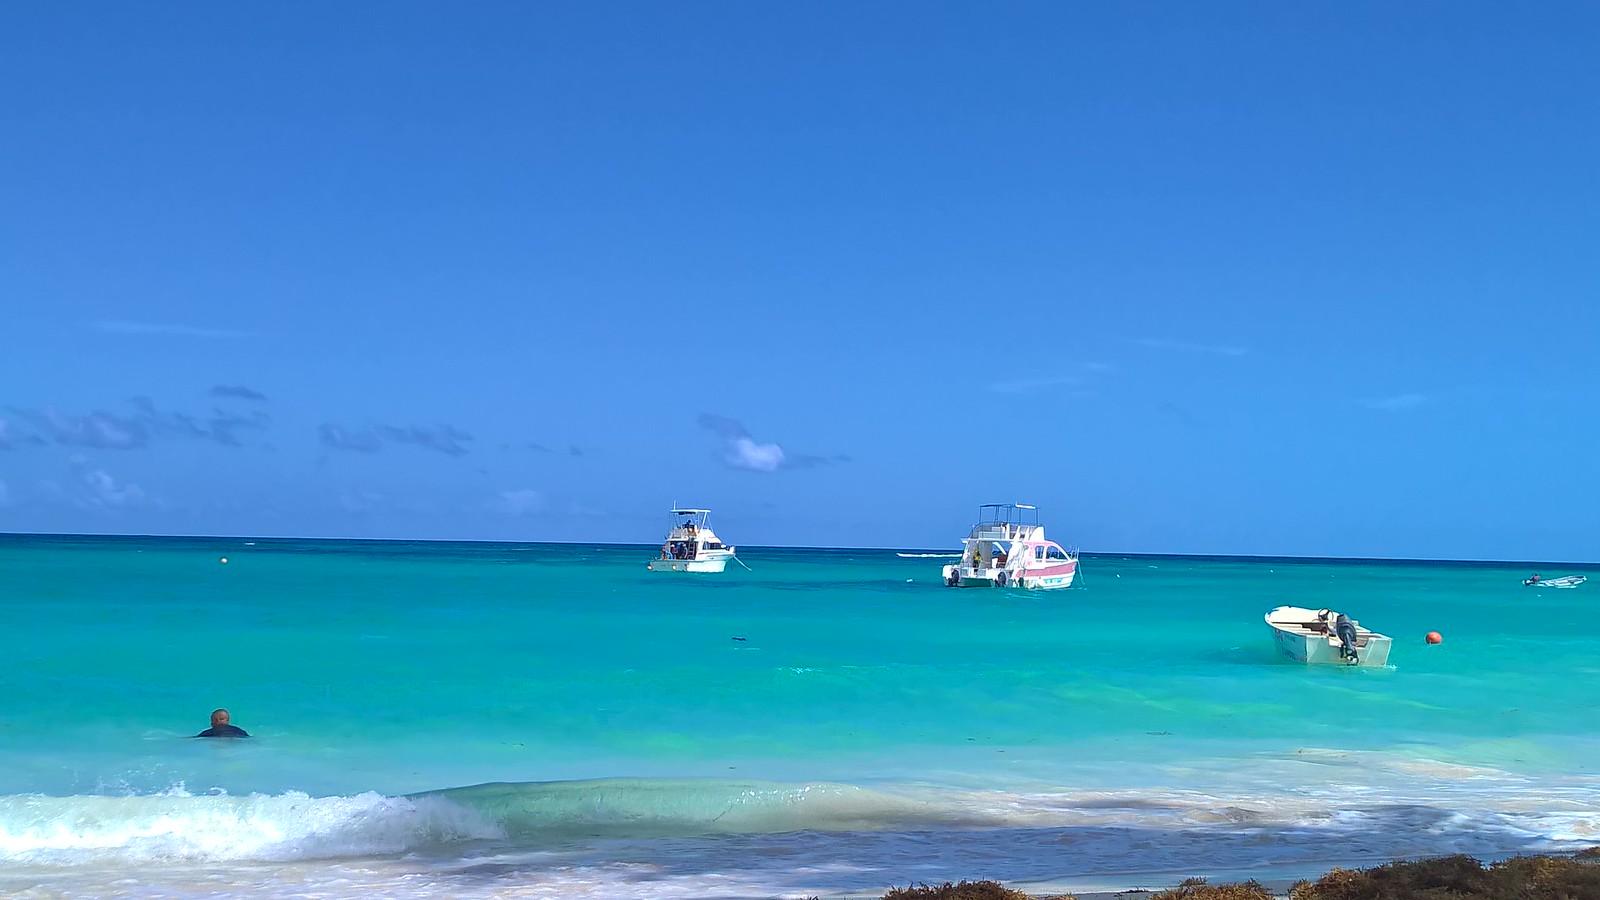 Карибское море в конце января